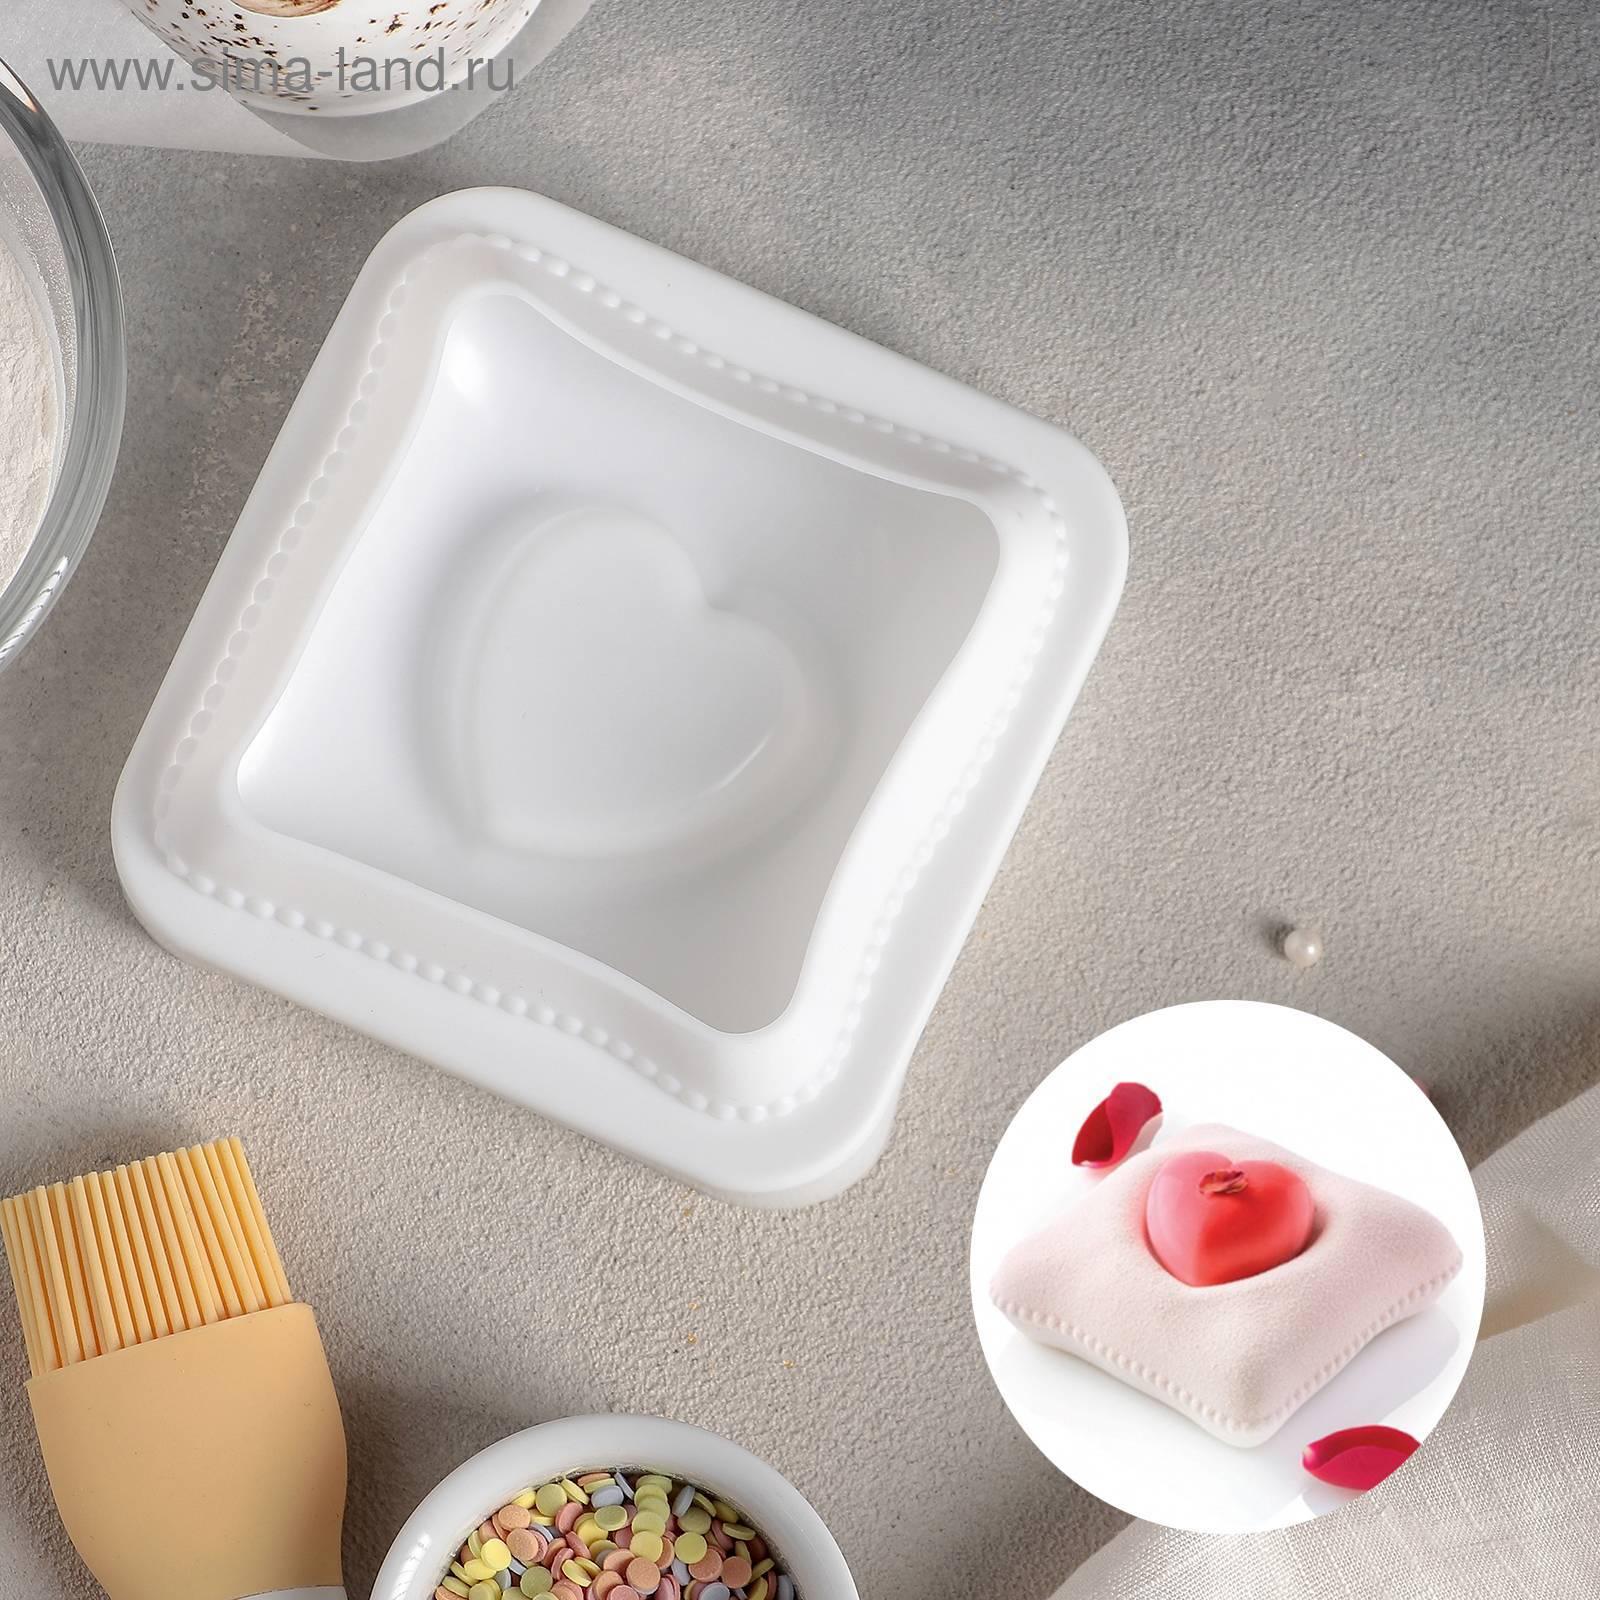 Форма для выпечки из китая – характеристика товара, цена, видео